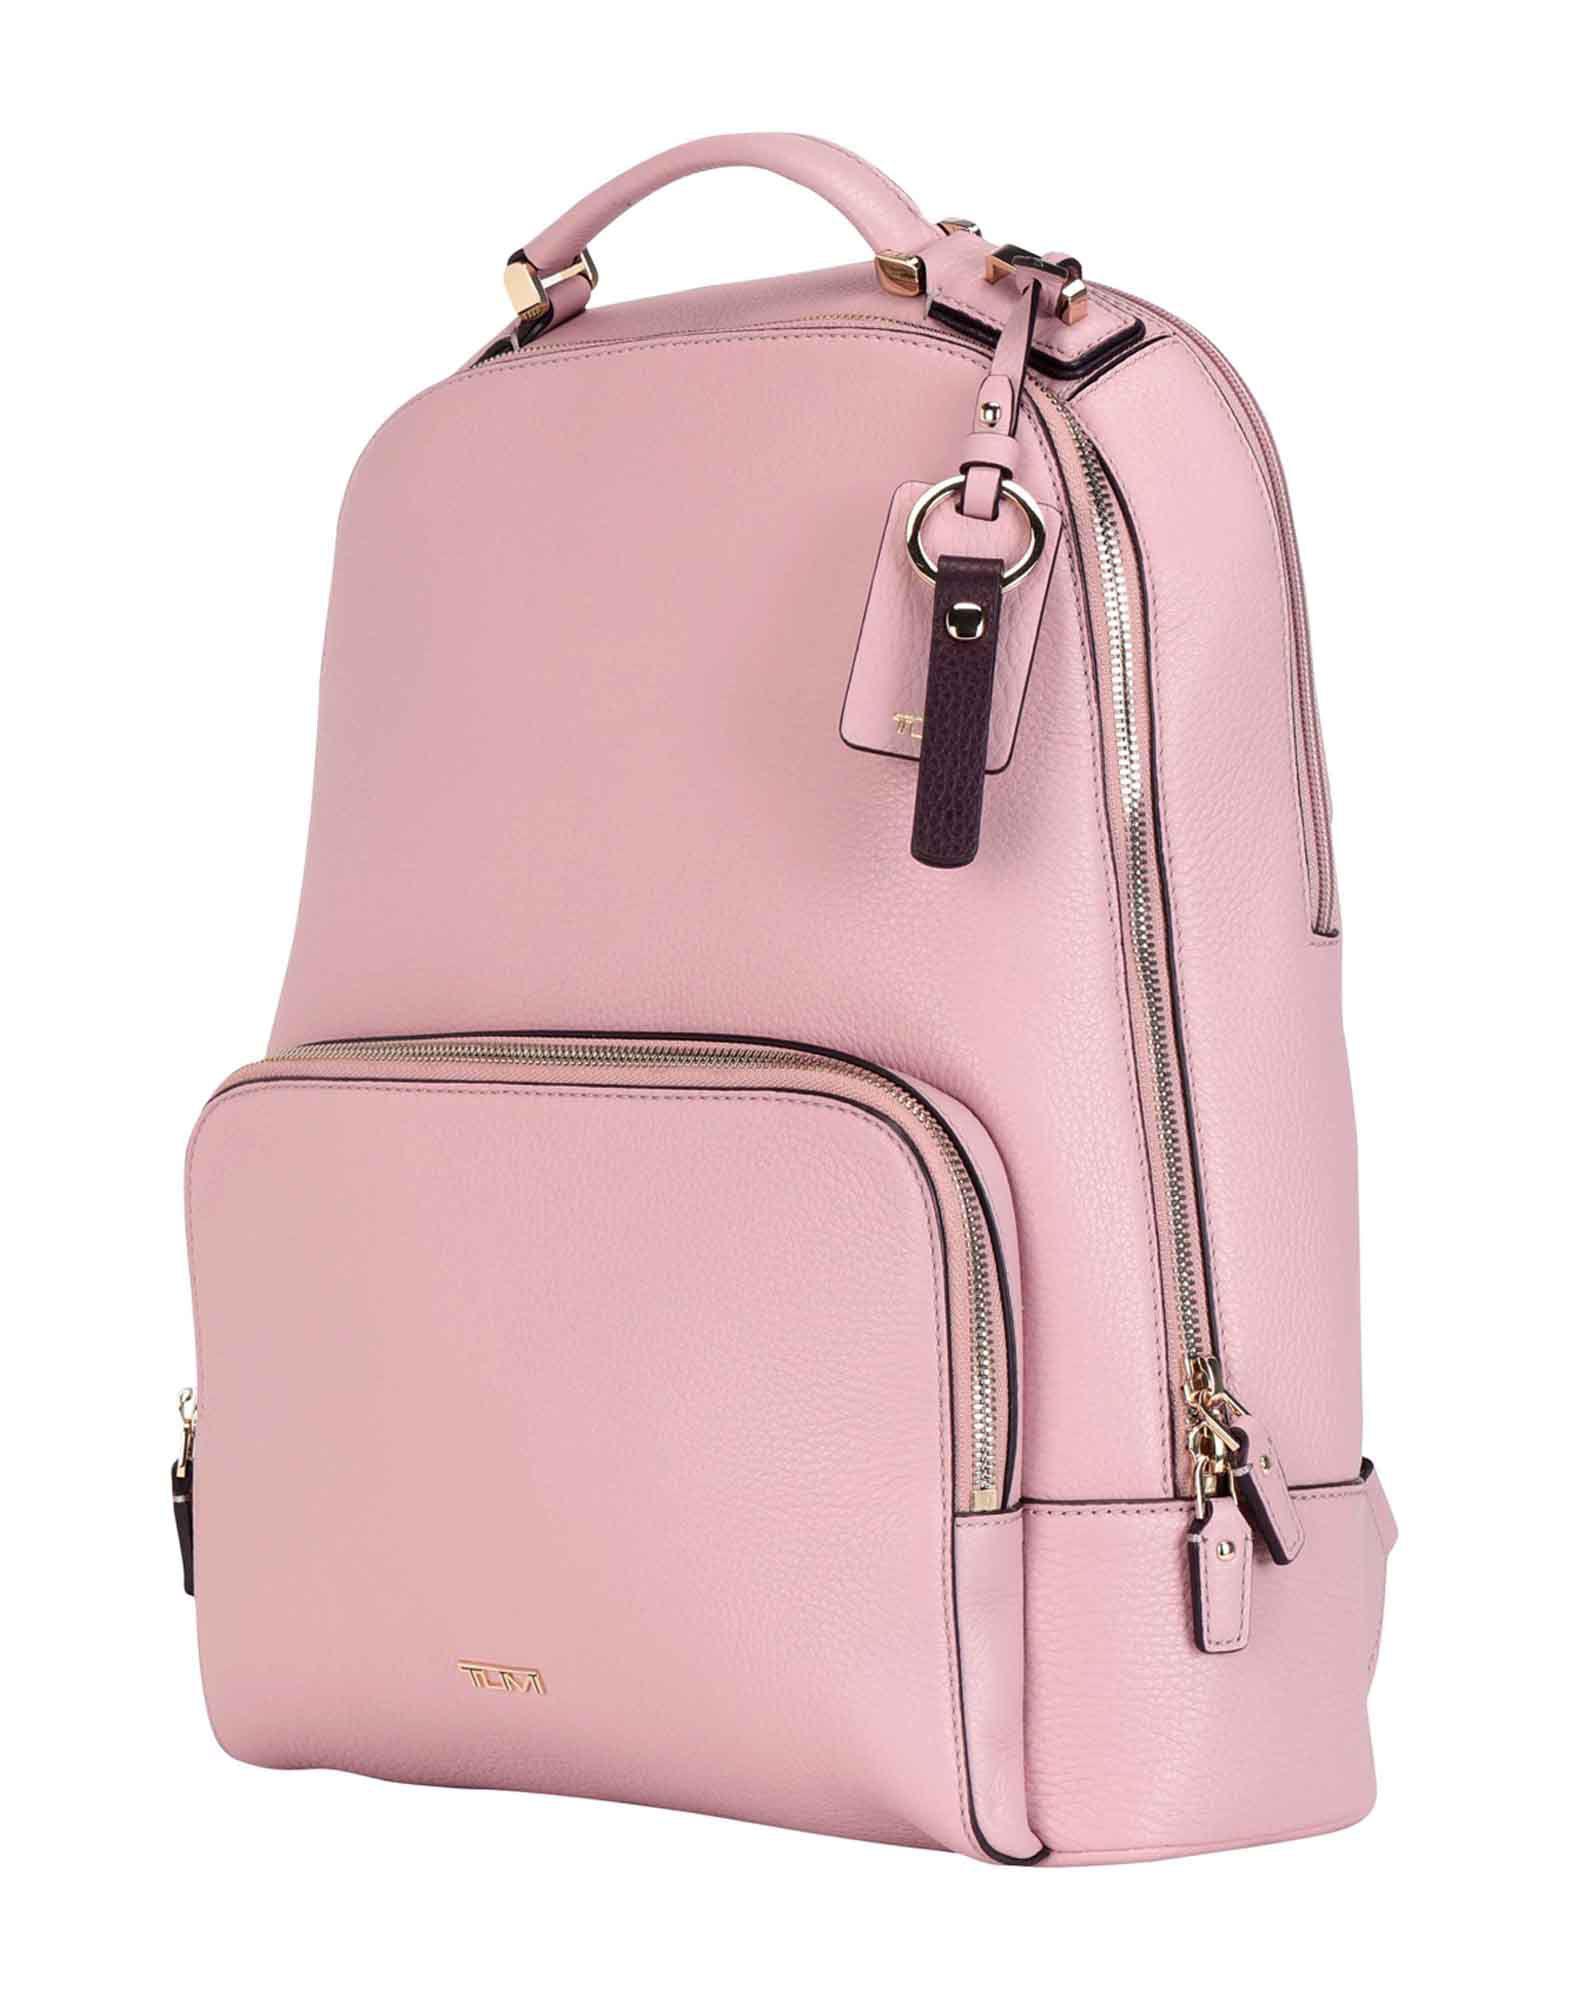 614daabbcbf3 Tumi Backpacks   Bum Bags in Pink - Lyst